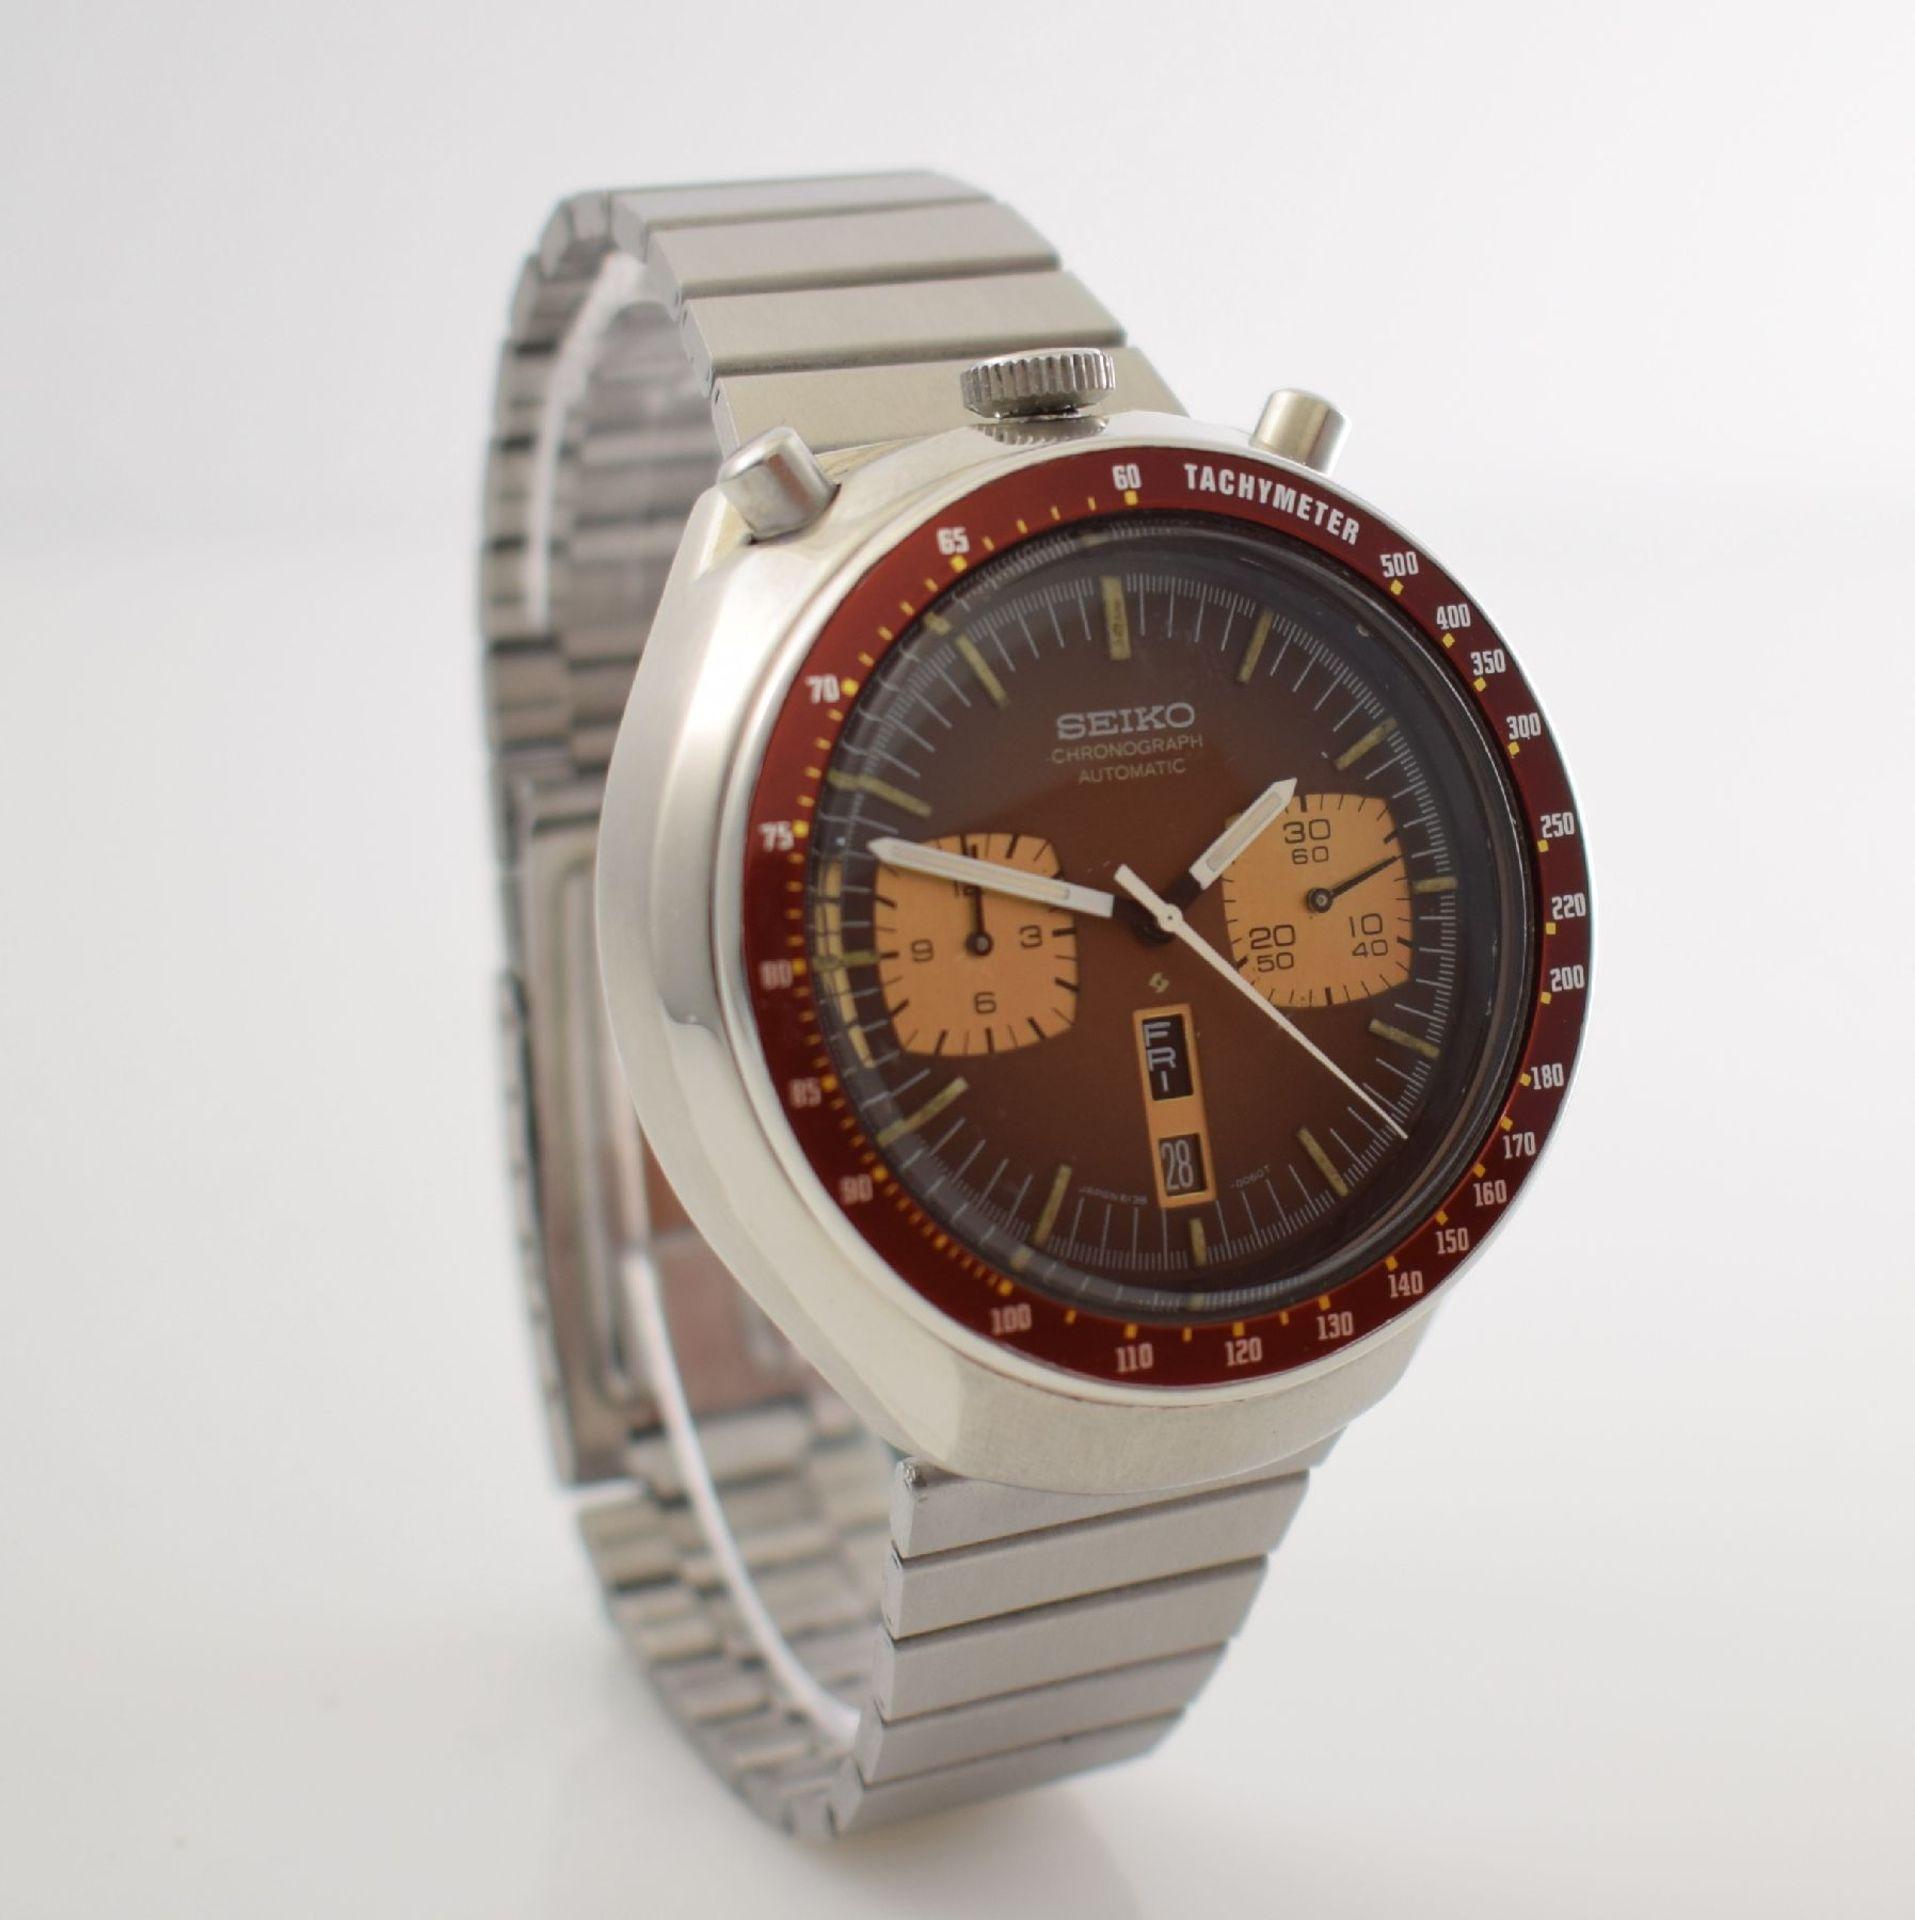 SEIKO sog. BULLHEAD Armbandchronograph, Japan um 1970, Automatik, Ref. 6138-0040, verschr. - Bild 5 aus 7